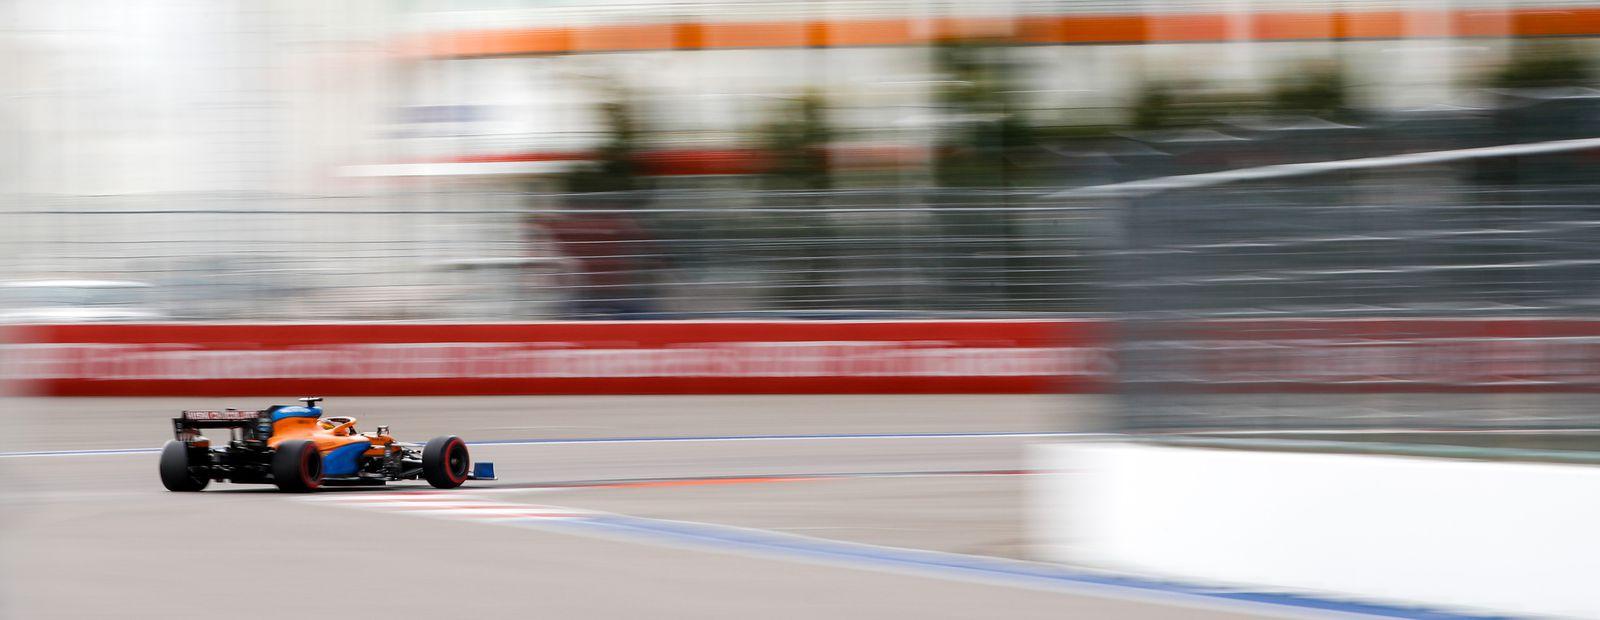 McLaren Racing announces multi-year partnership extension with CNBC